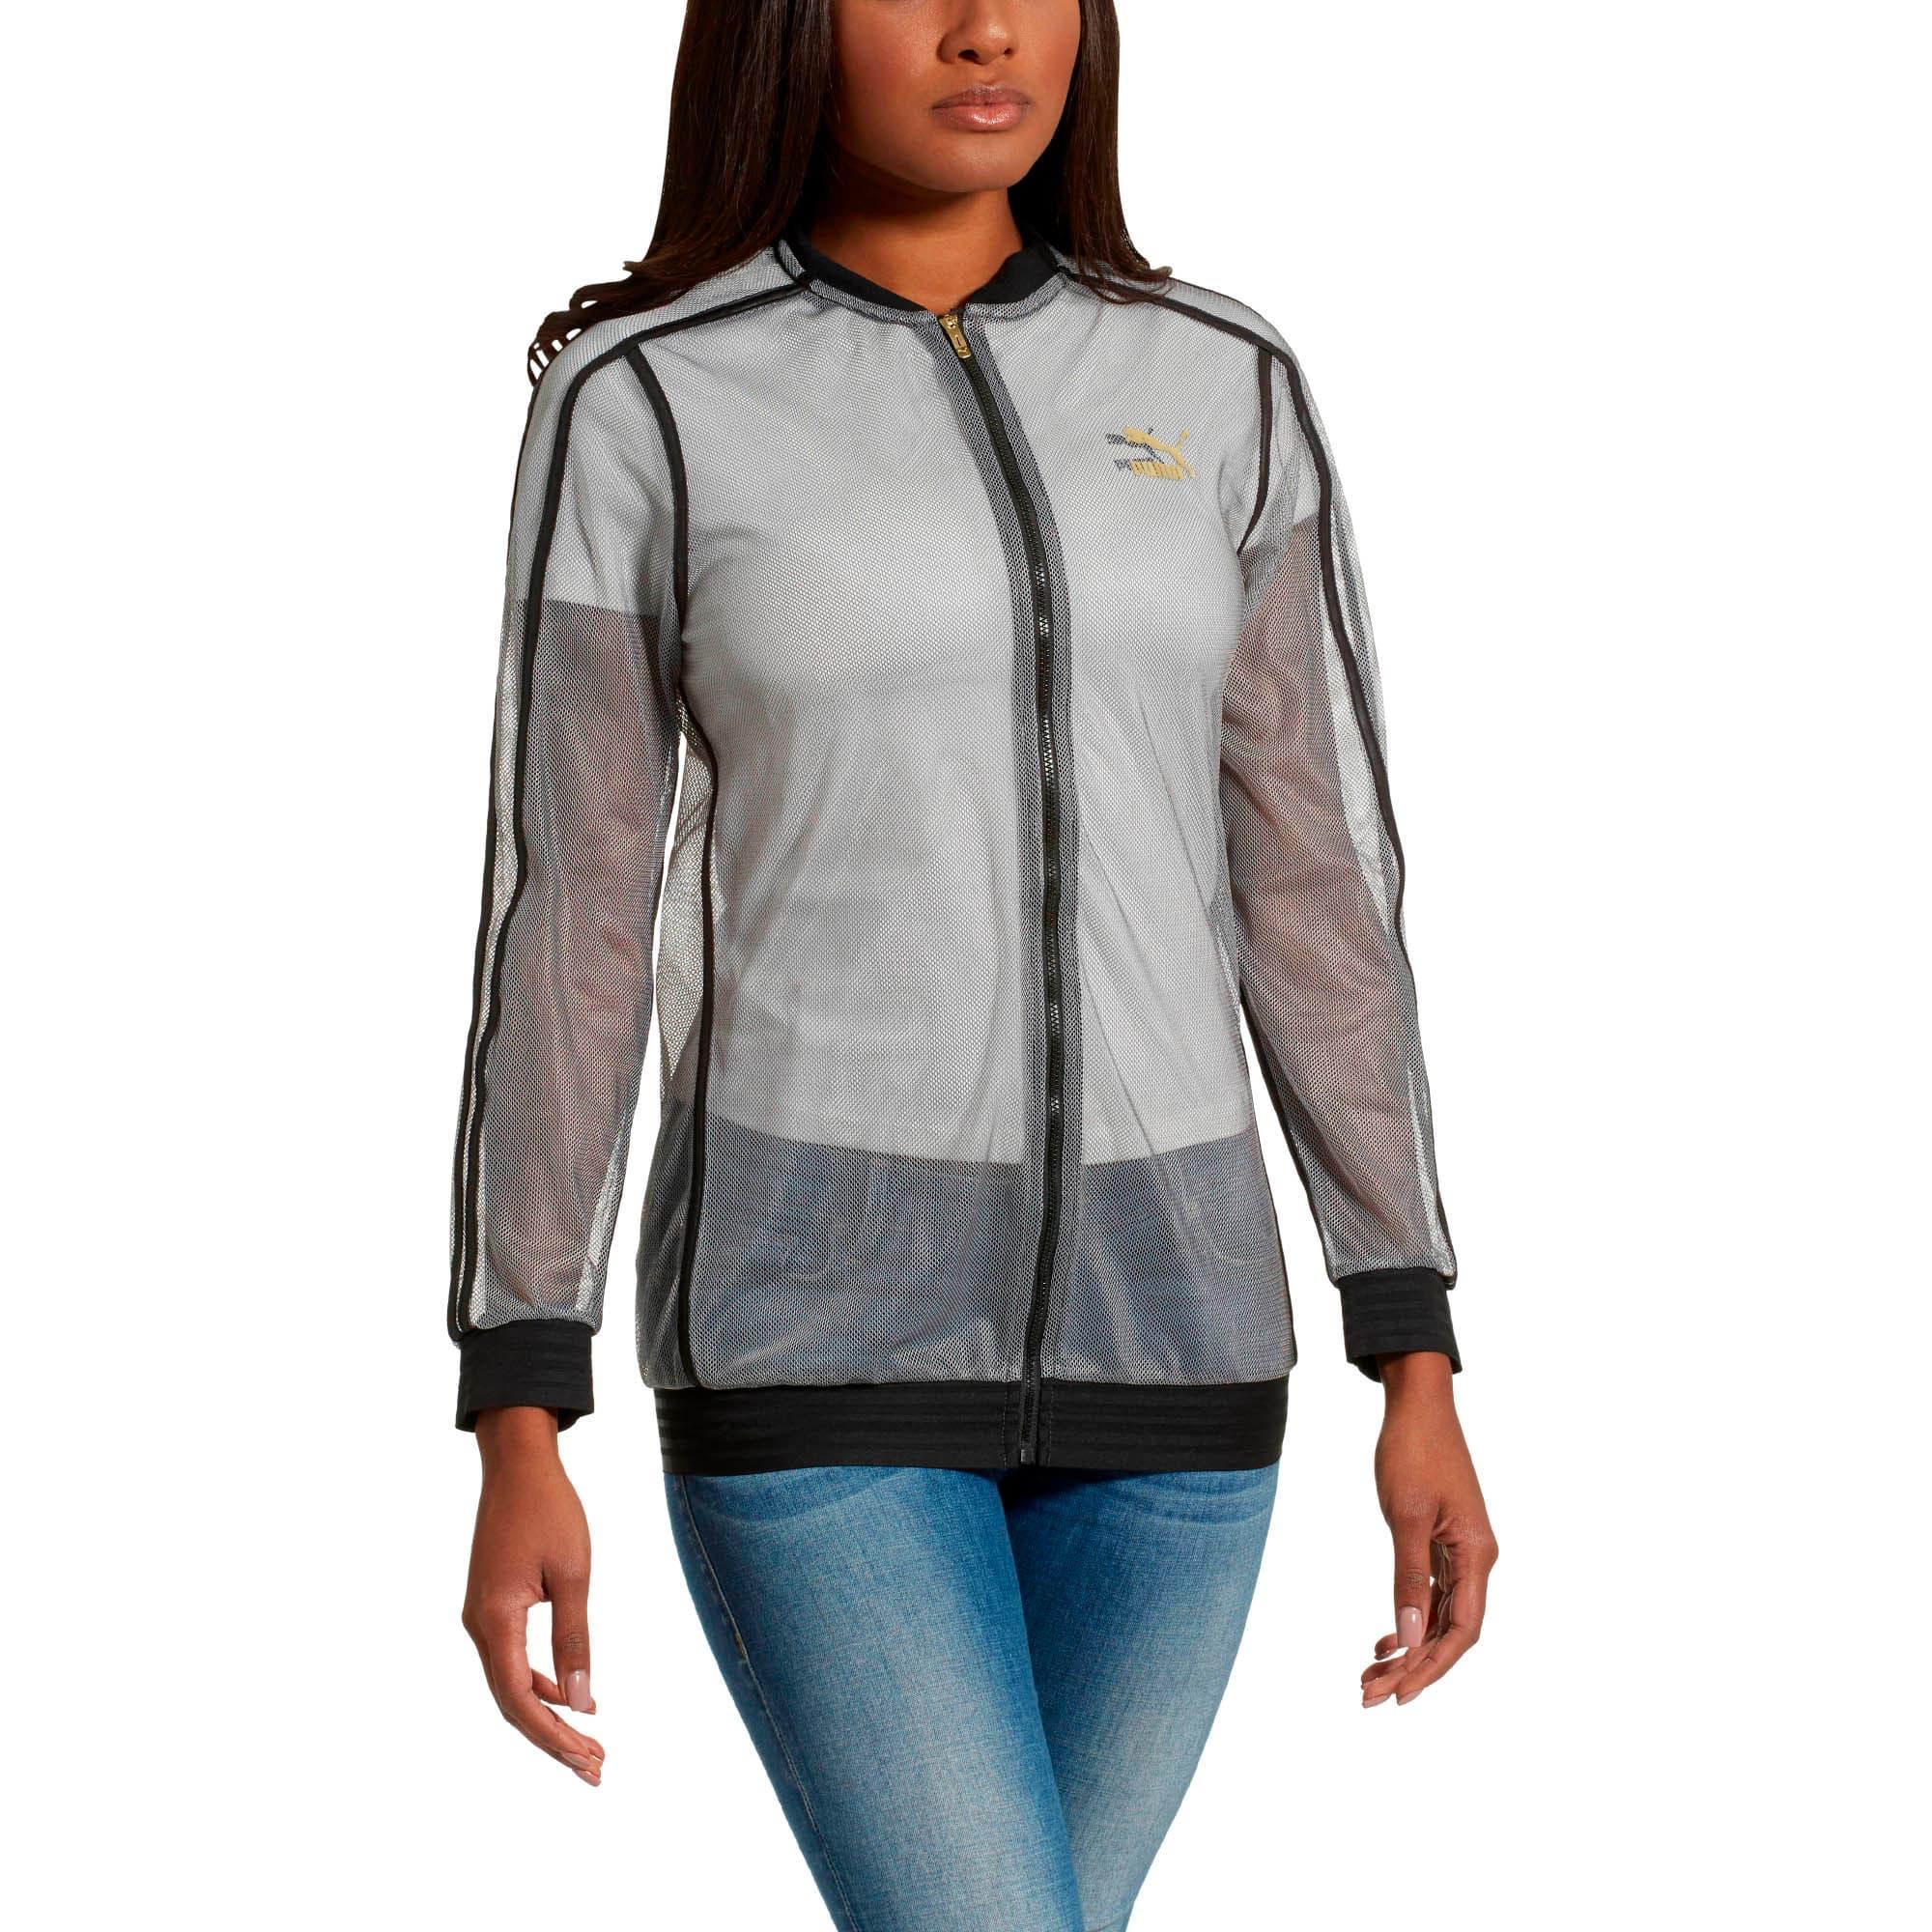 Thumbnail 2 of Fashion T7 Jacket, Puma Black, medium